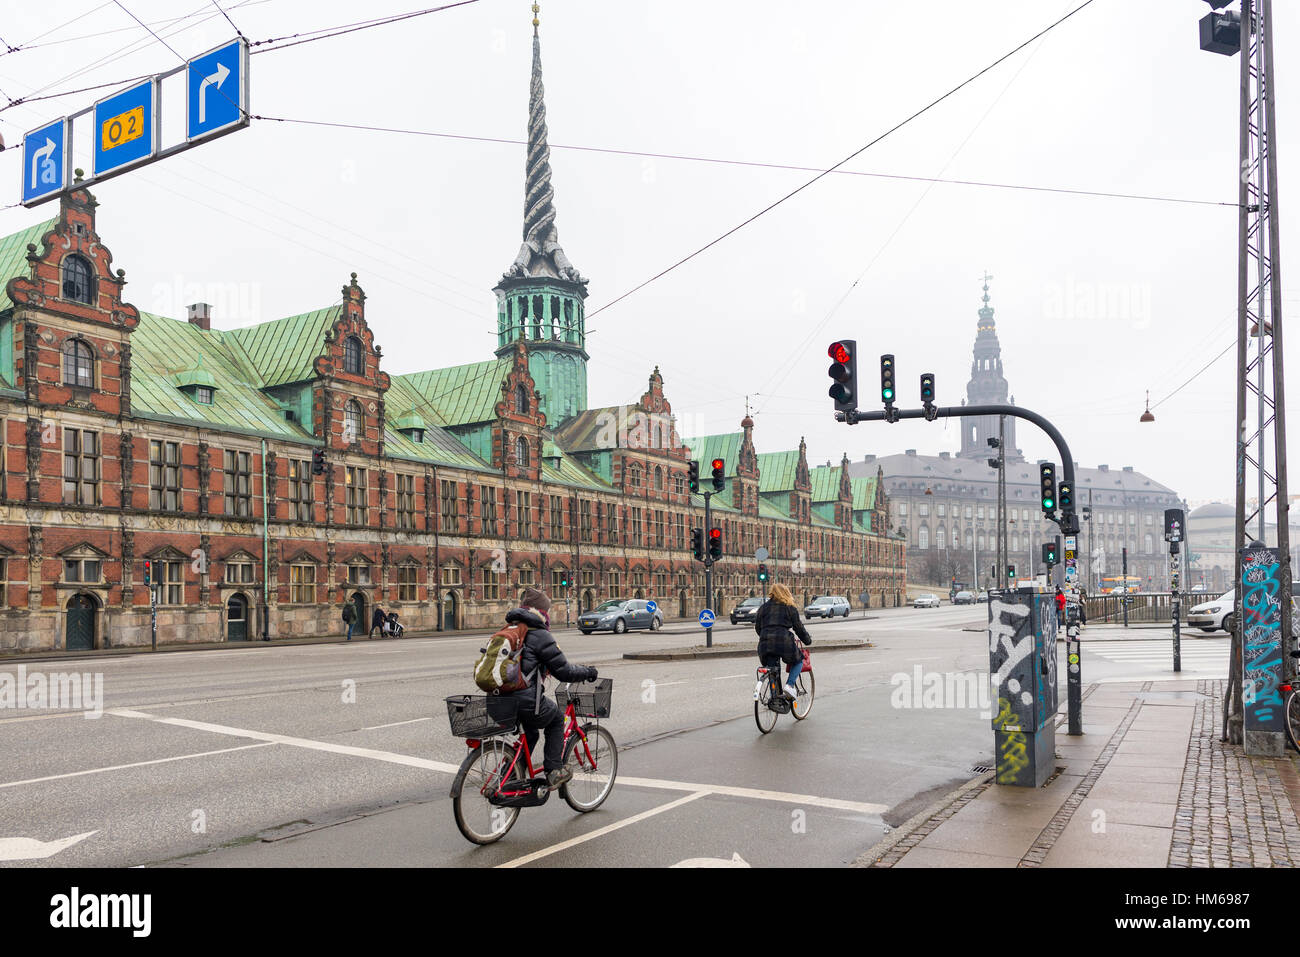 Cyclists pass the Copenhagen Staock Market building, Denmark - Stock Image